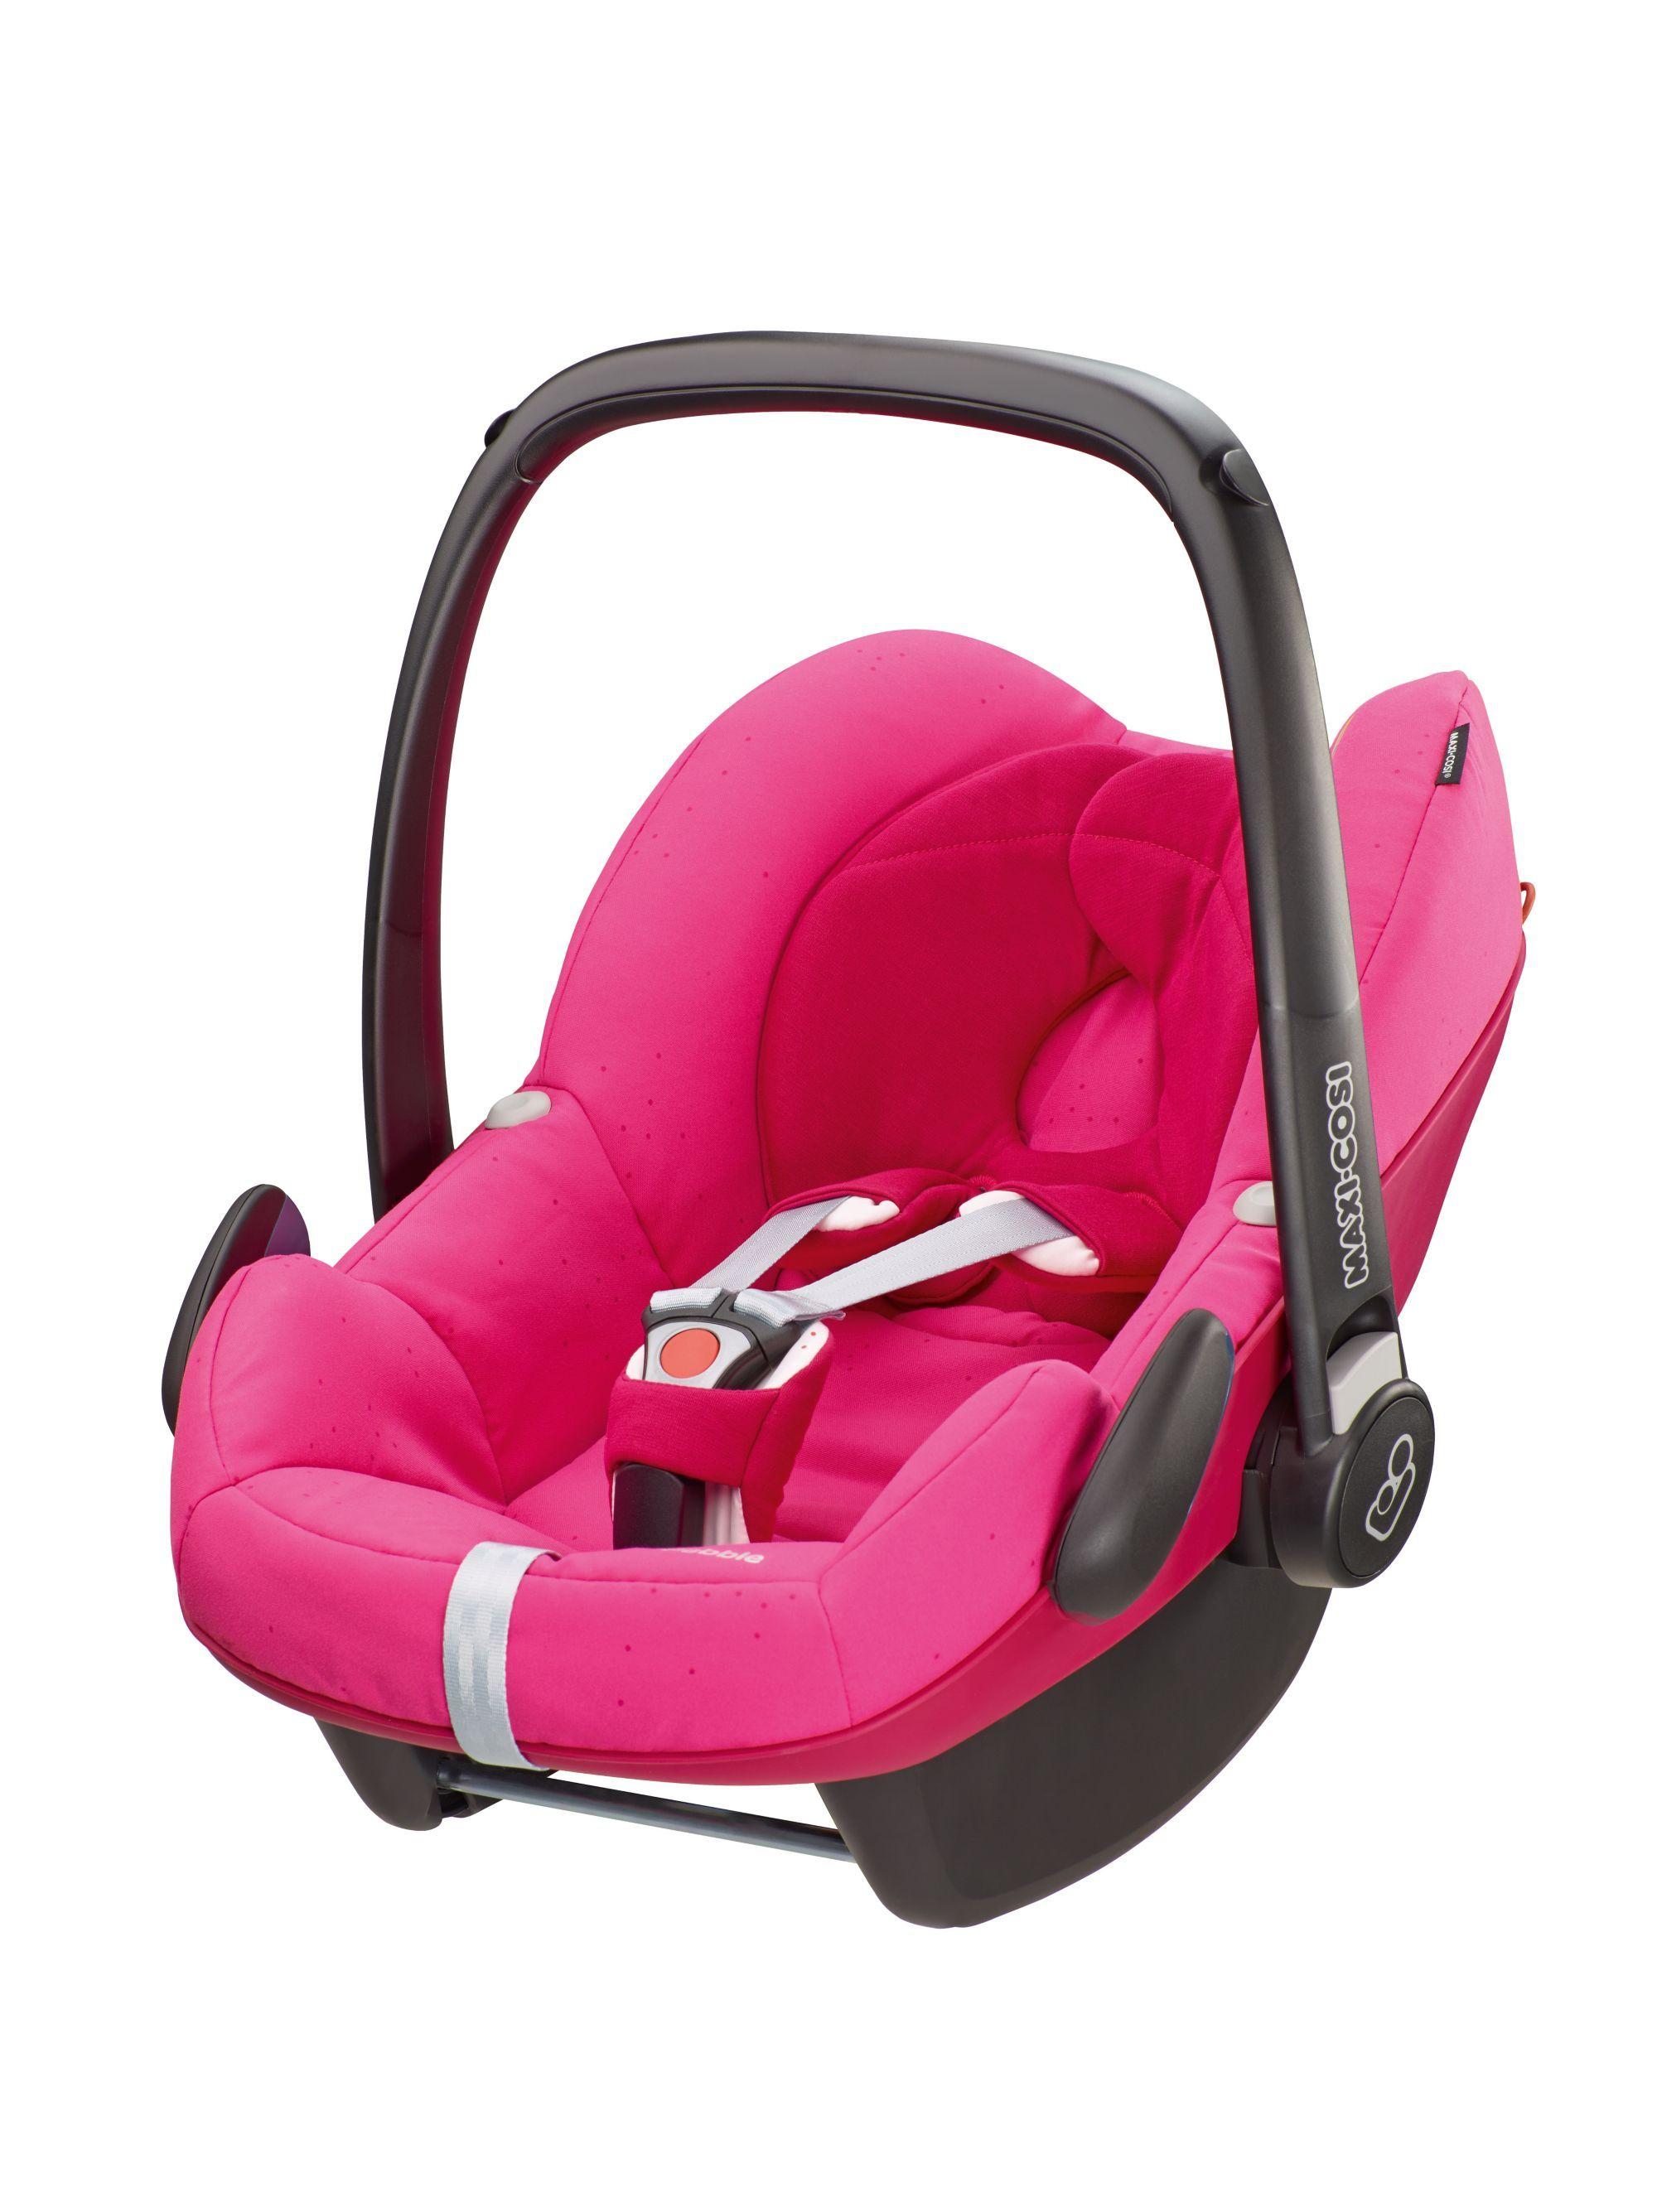 Maxi-Cosi Pebble Car Seat (Group 0+) - Berry